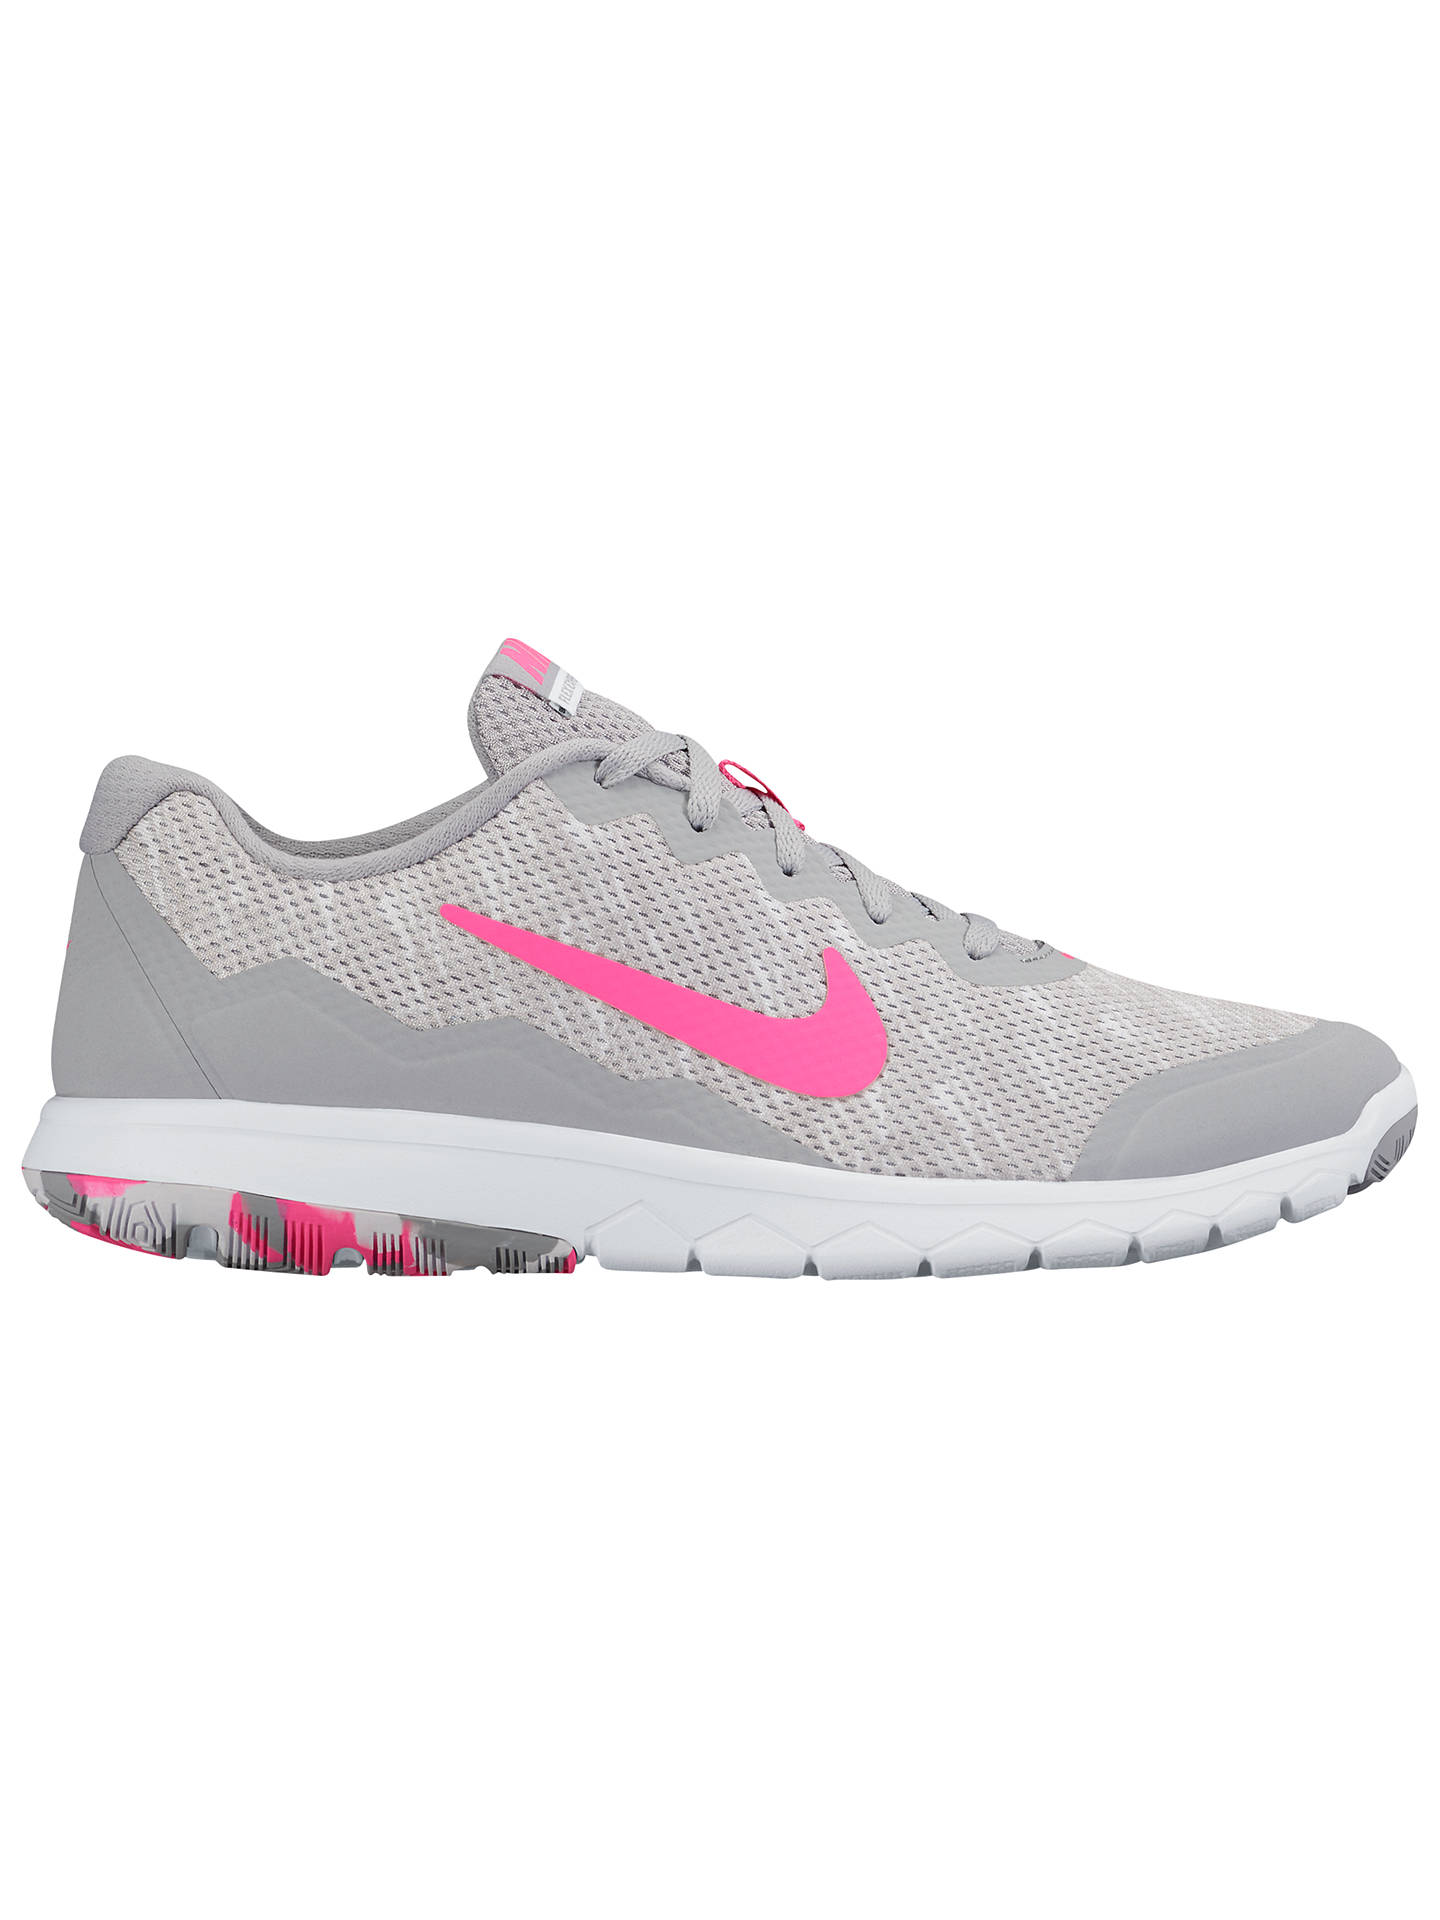 1d7e62a72201 Buy Nike Flex Experience Run 4 Premium Women s Running Shoes